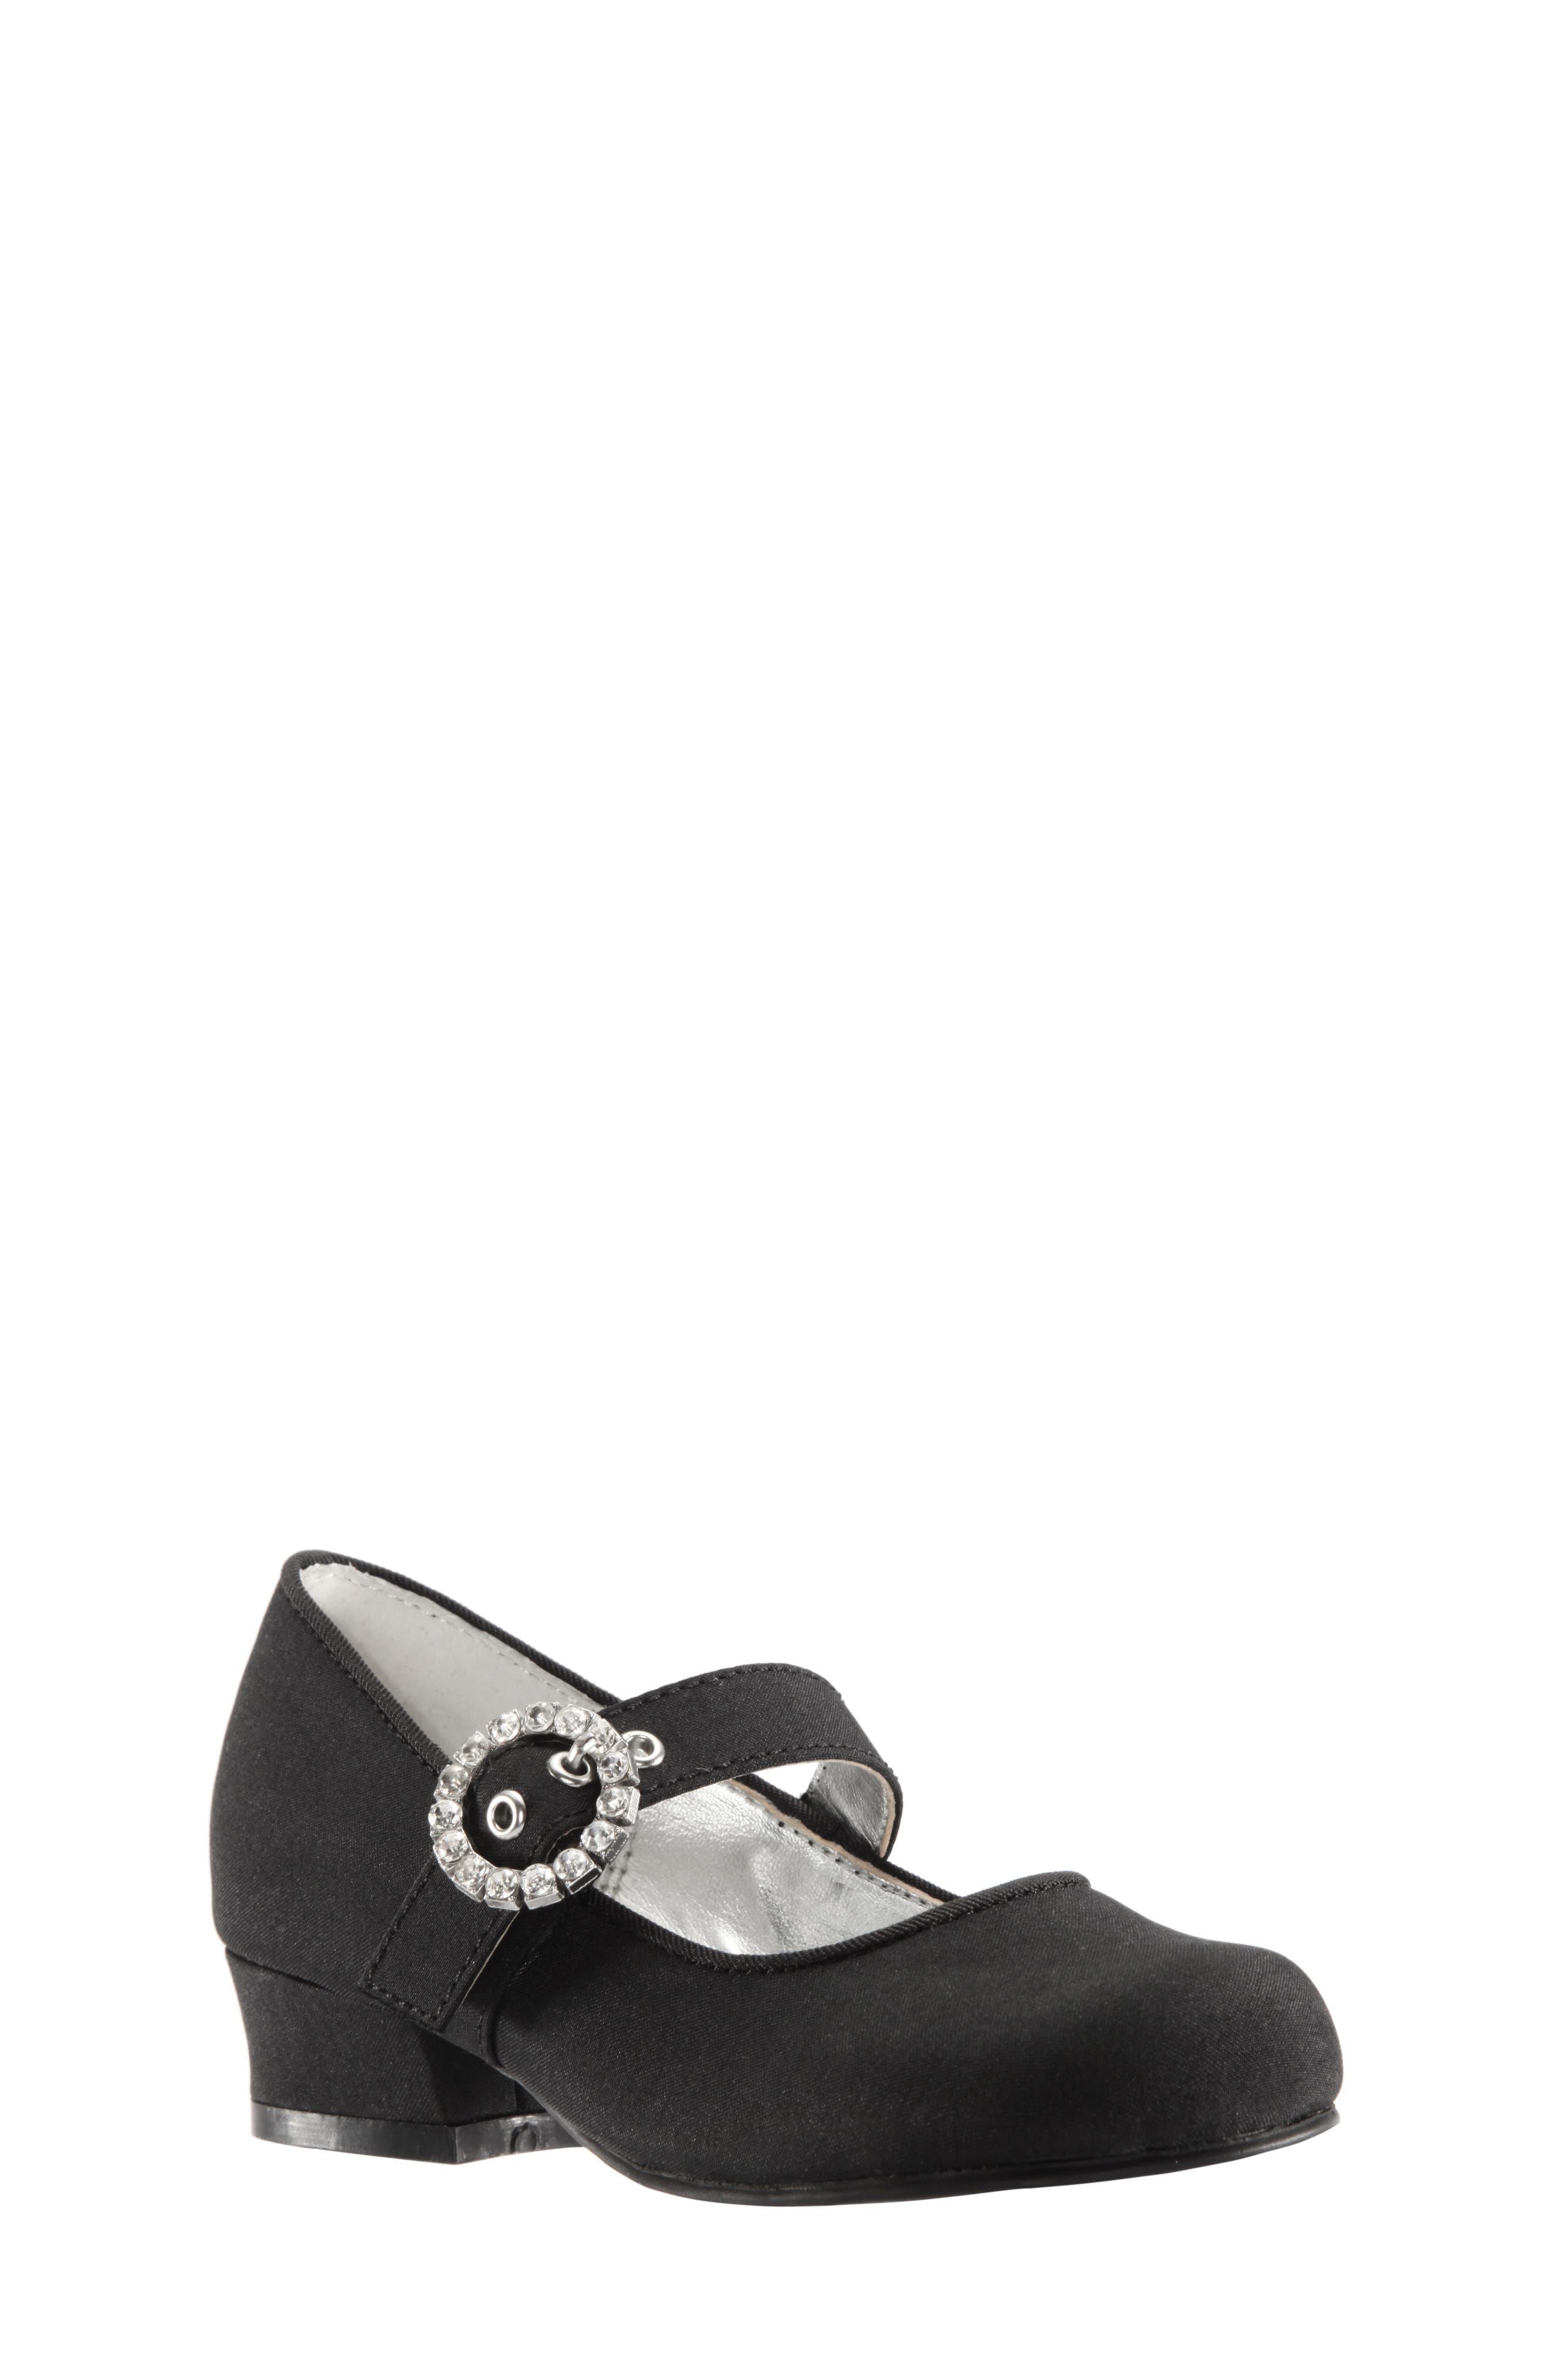 Dulce Block Heel Mary Jane,                         Main,                         color, BLACK LUSTER SATIN